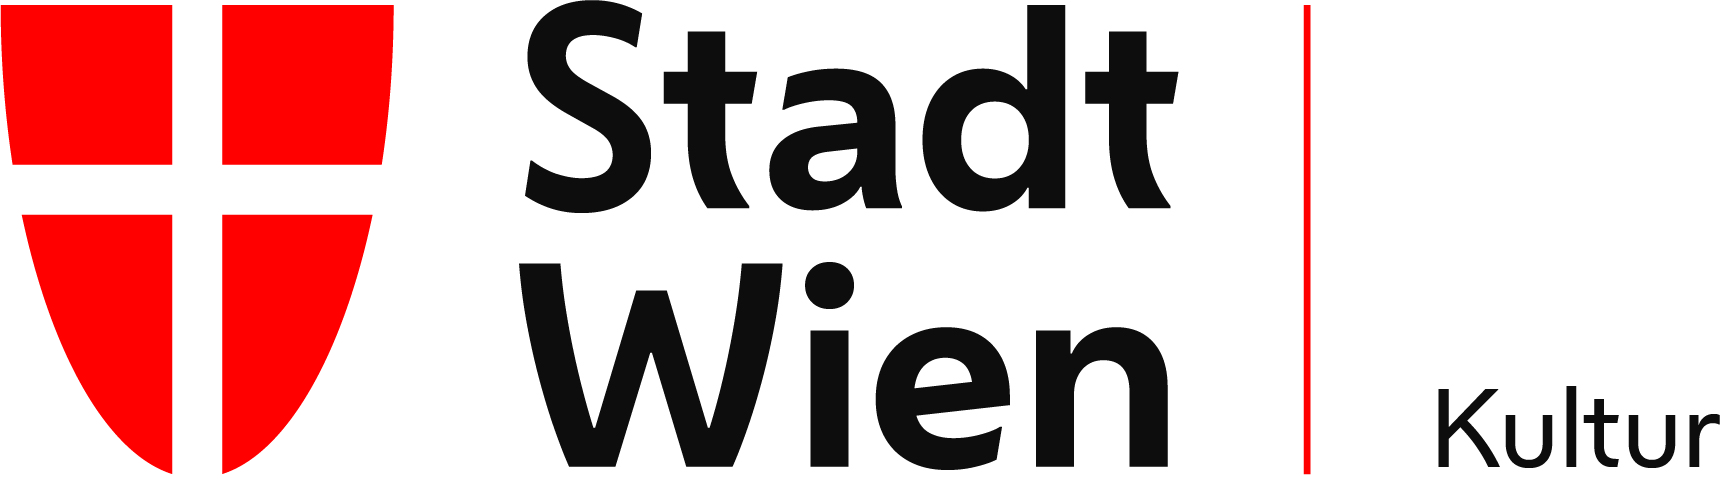 stadt_wien_kultur_pos_cmyk-1